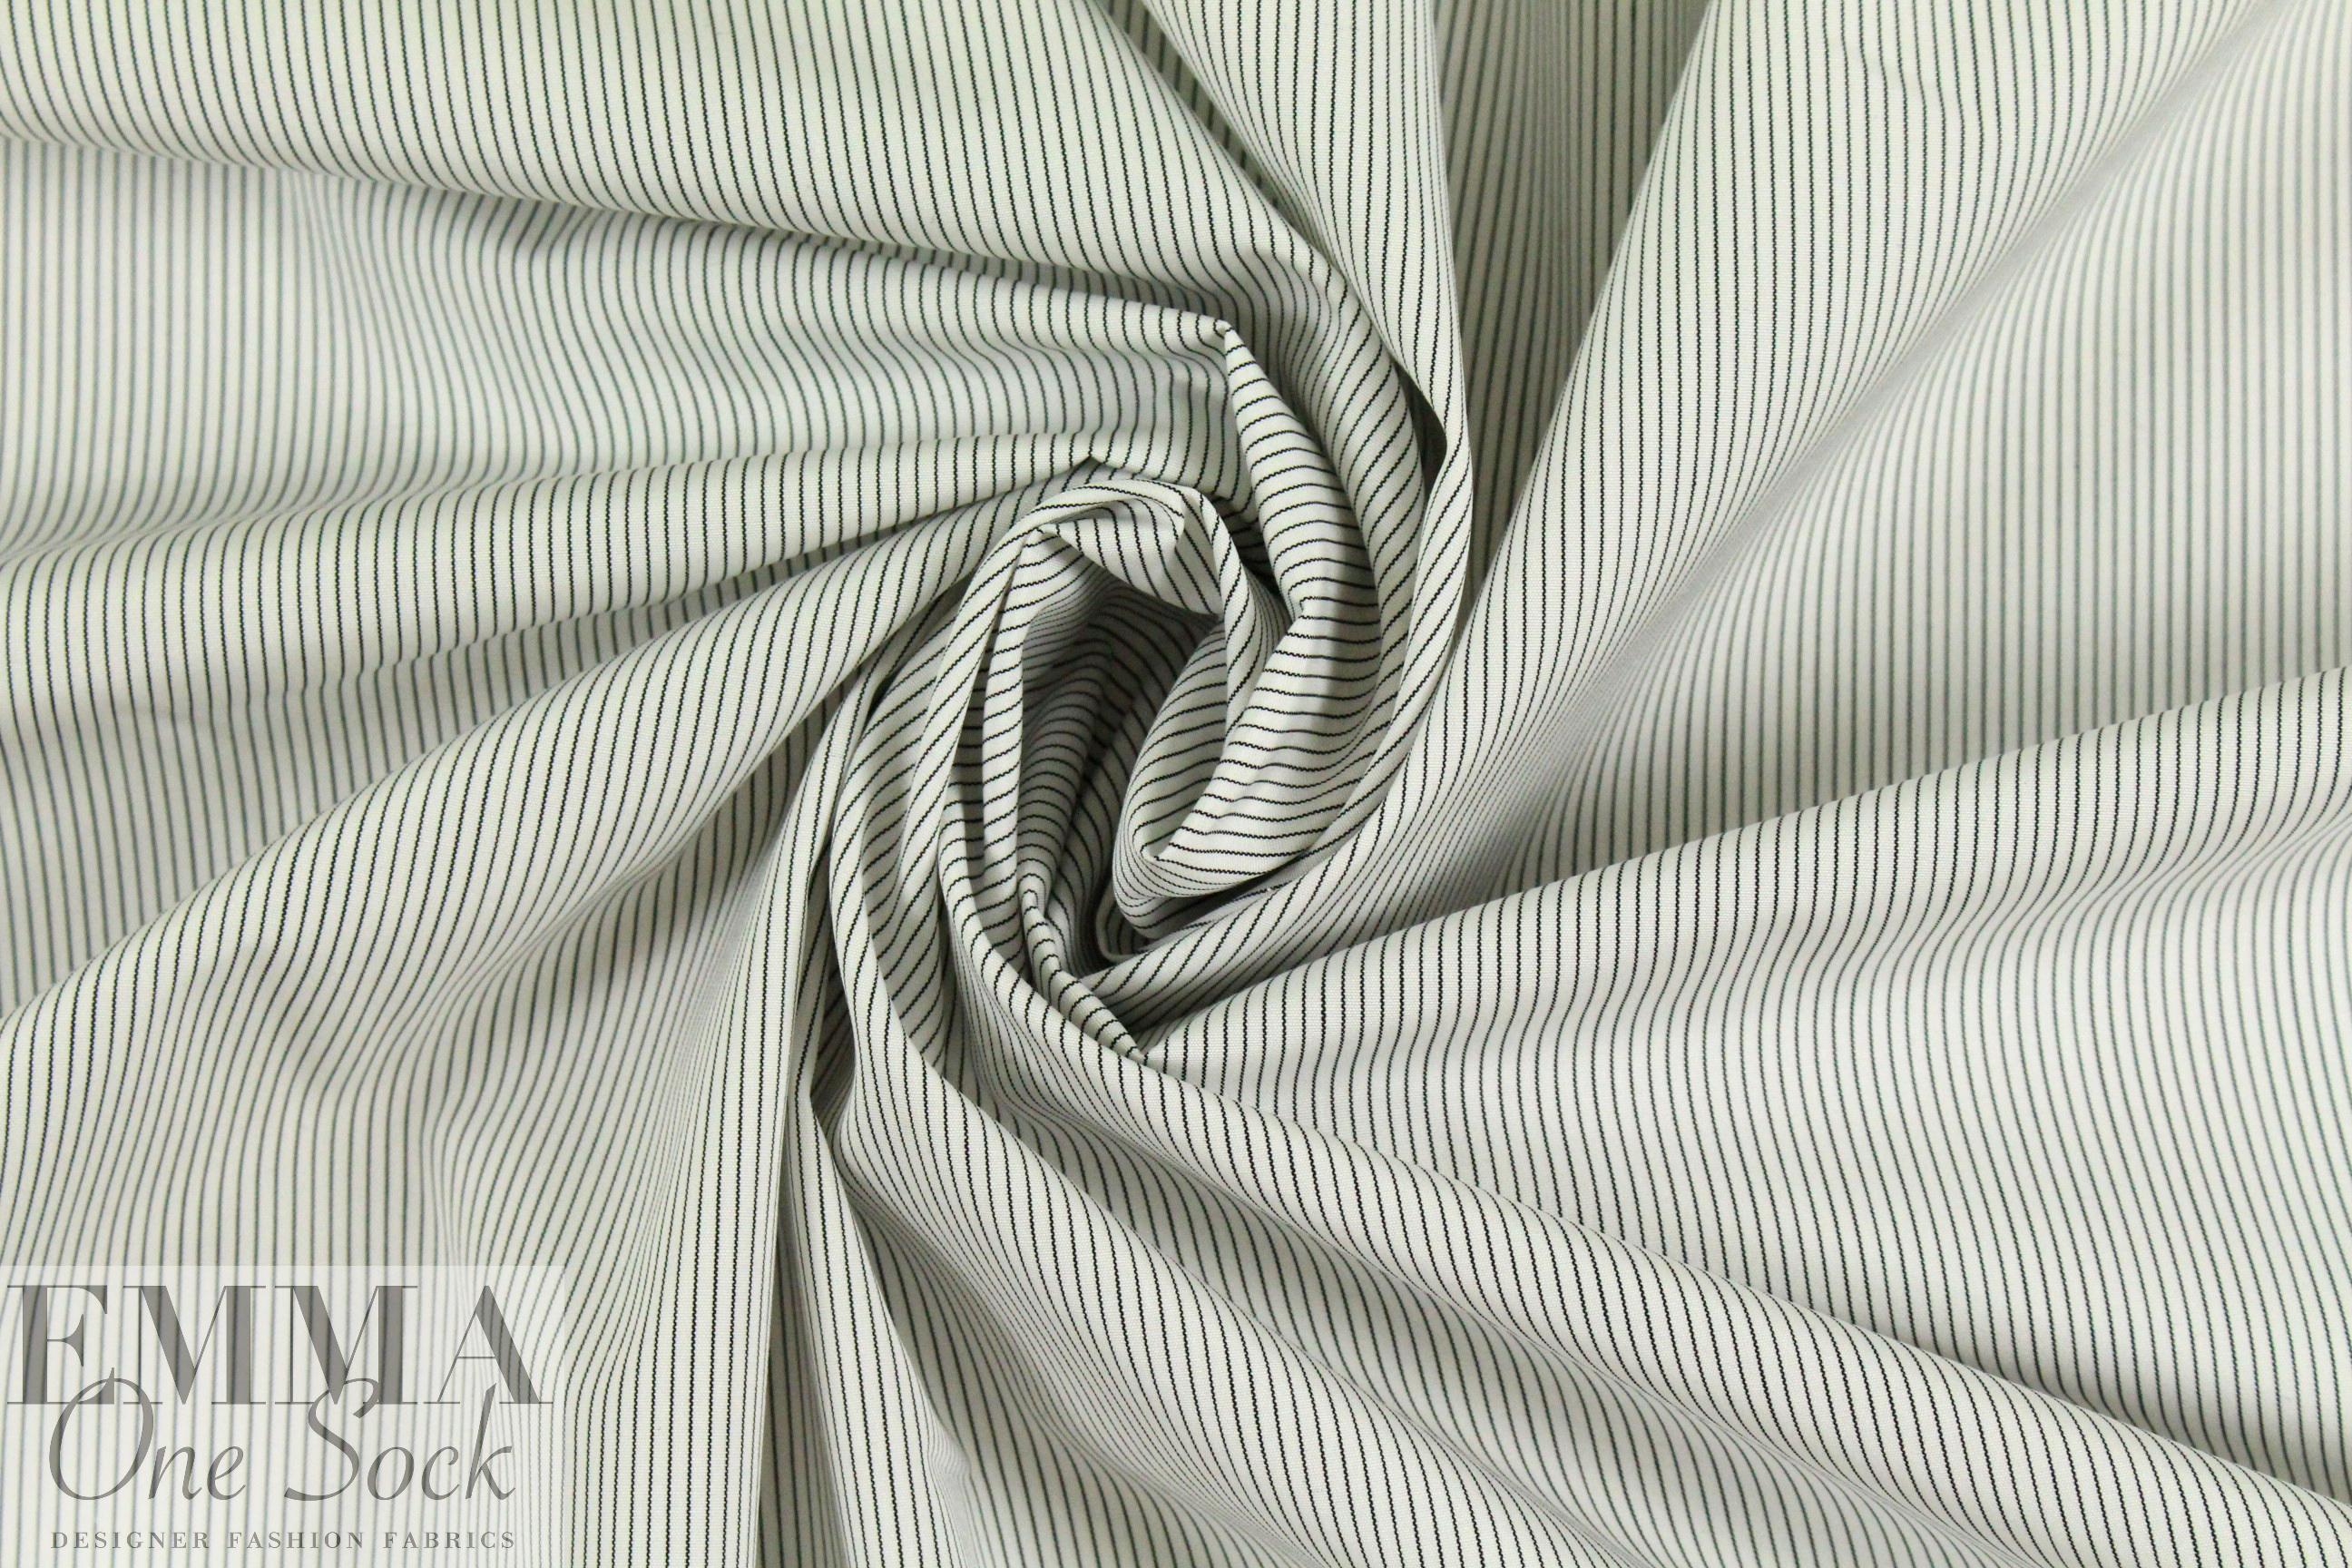 Italian tiny stripe yarn-dyed cotton shirting from